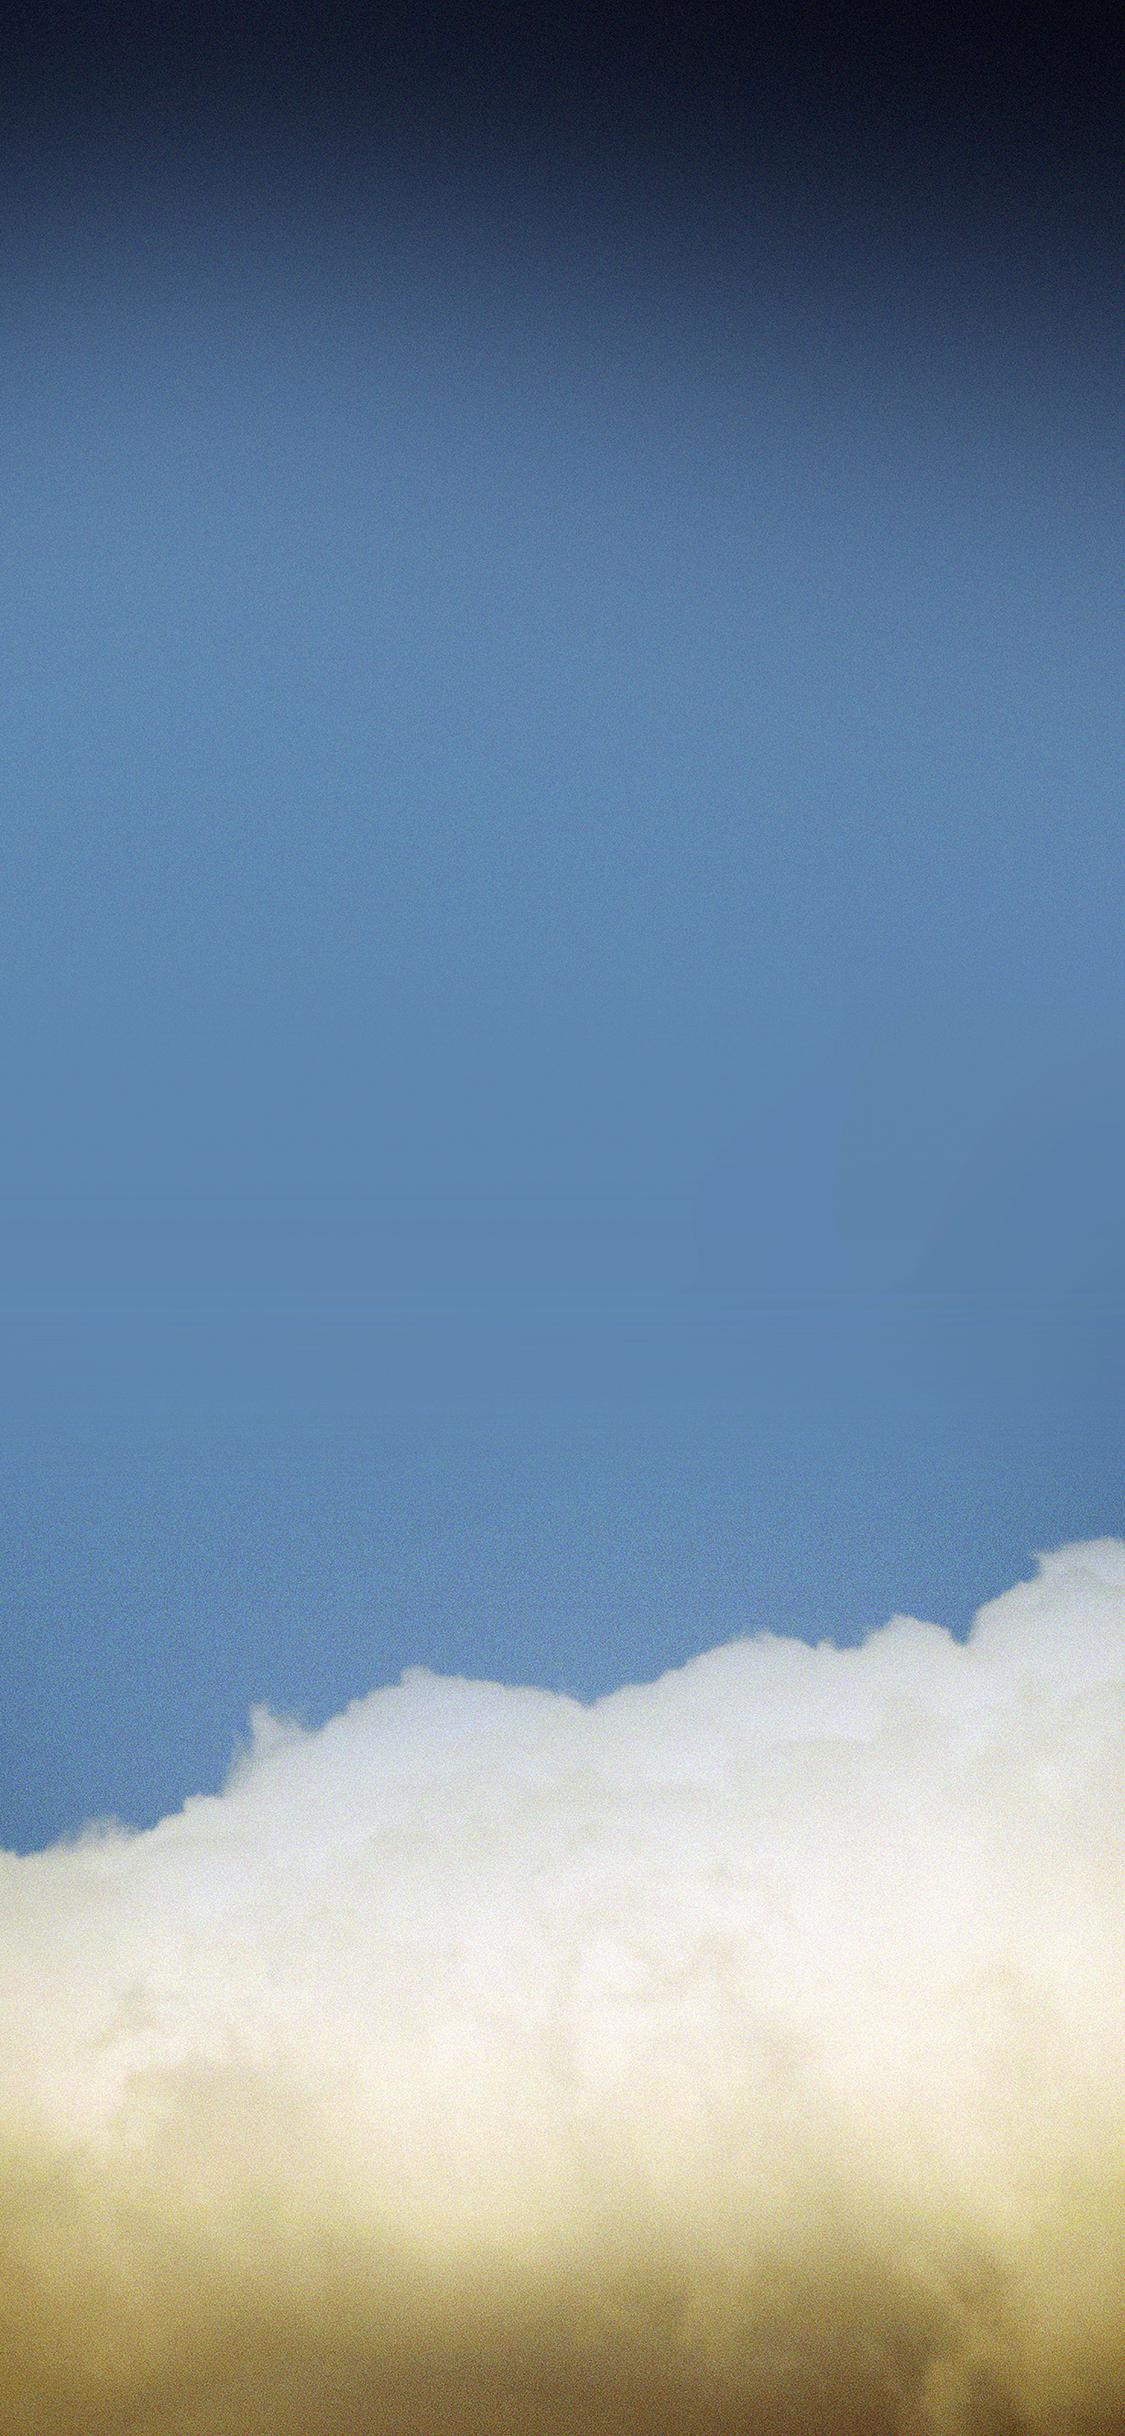 iPhoneXpapers.com-Apple-iPhone-wallpaper-mb49-wallpaper-sky-cloud-alone-dark